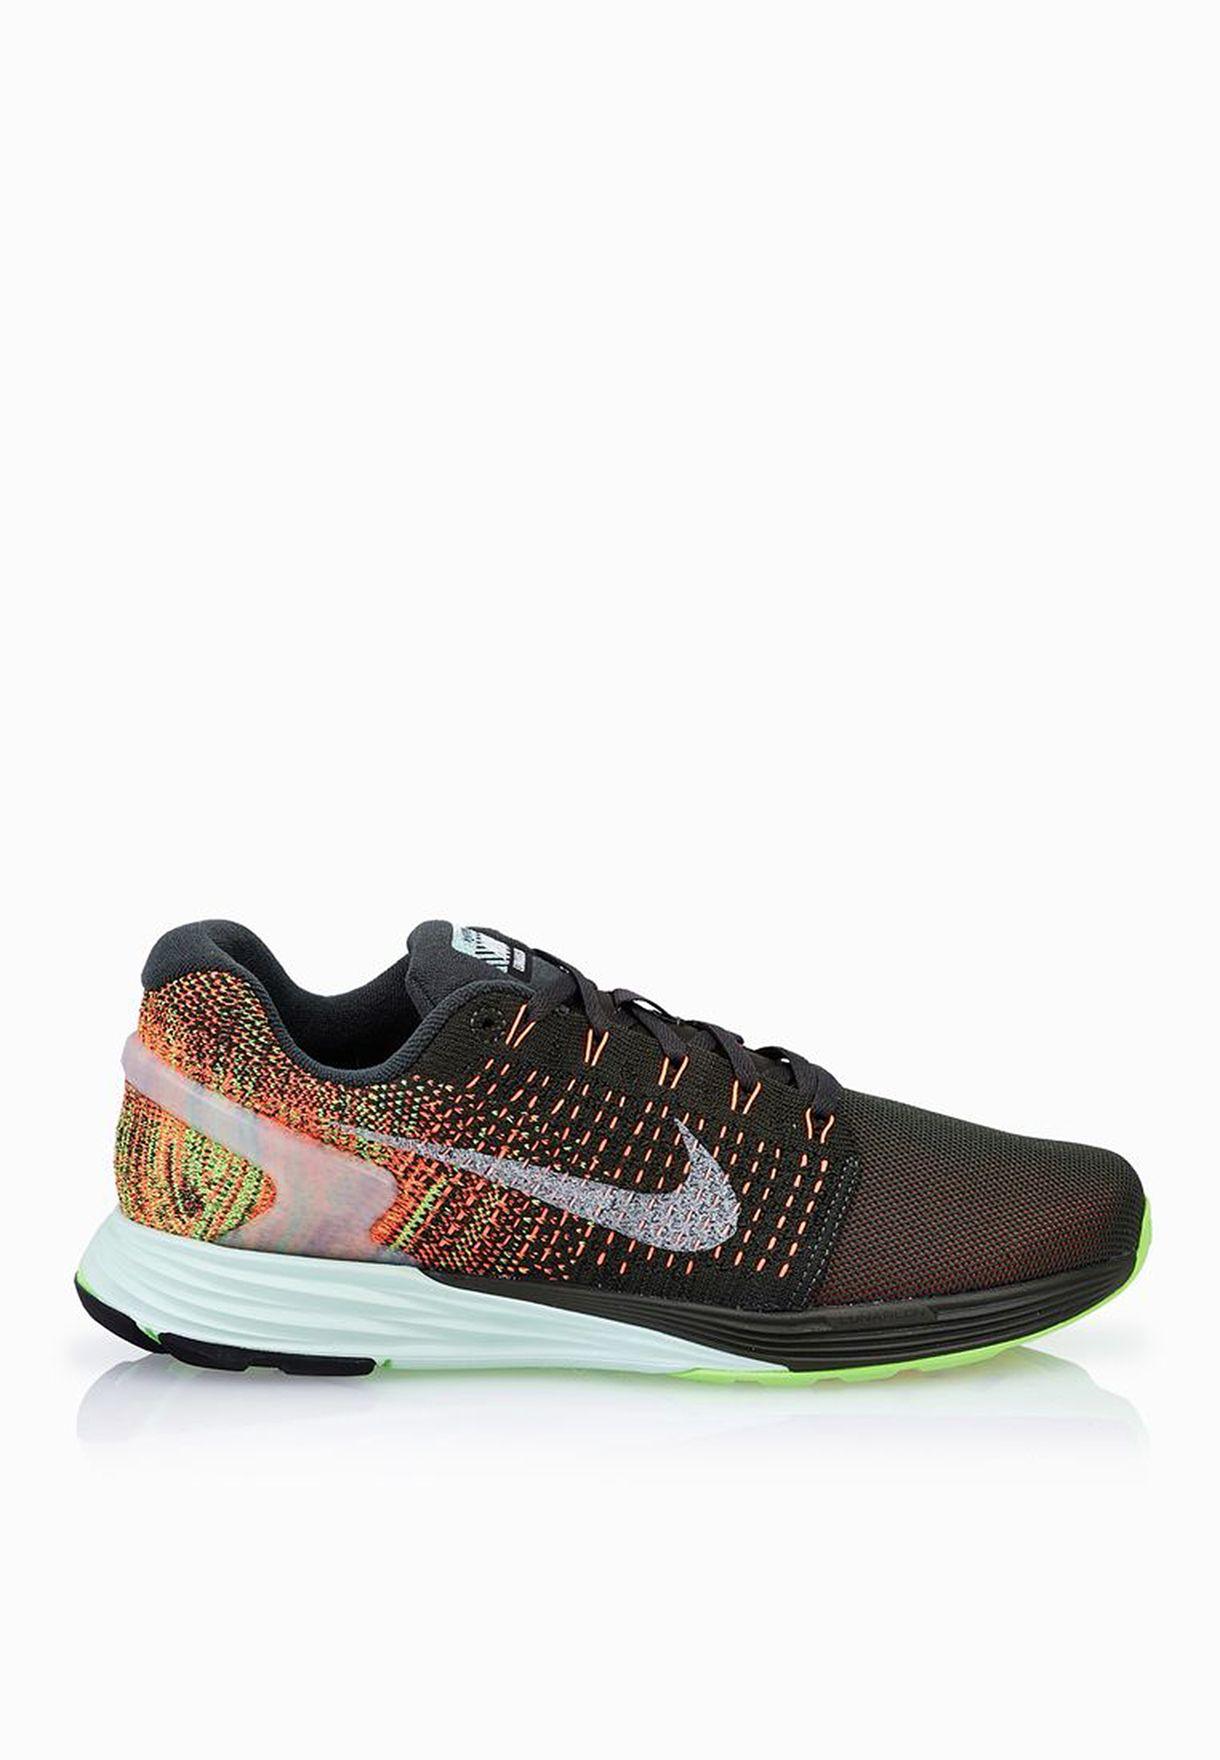 f73494e97a Shop Nike multicolor Lunarglide 7 Flash 803567-300 for Women in UAE ...